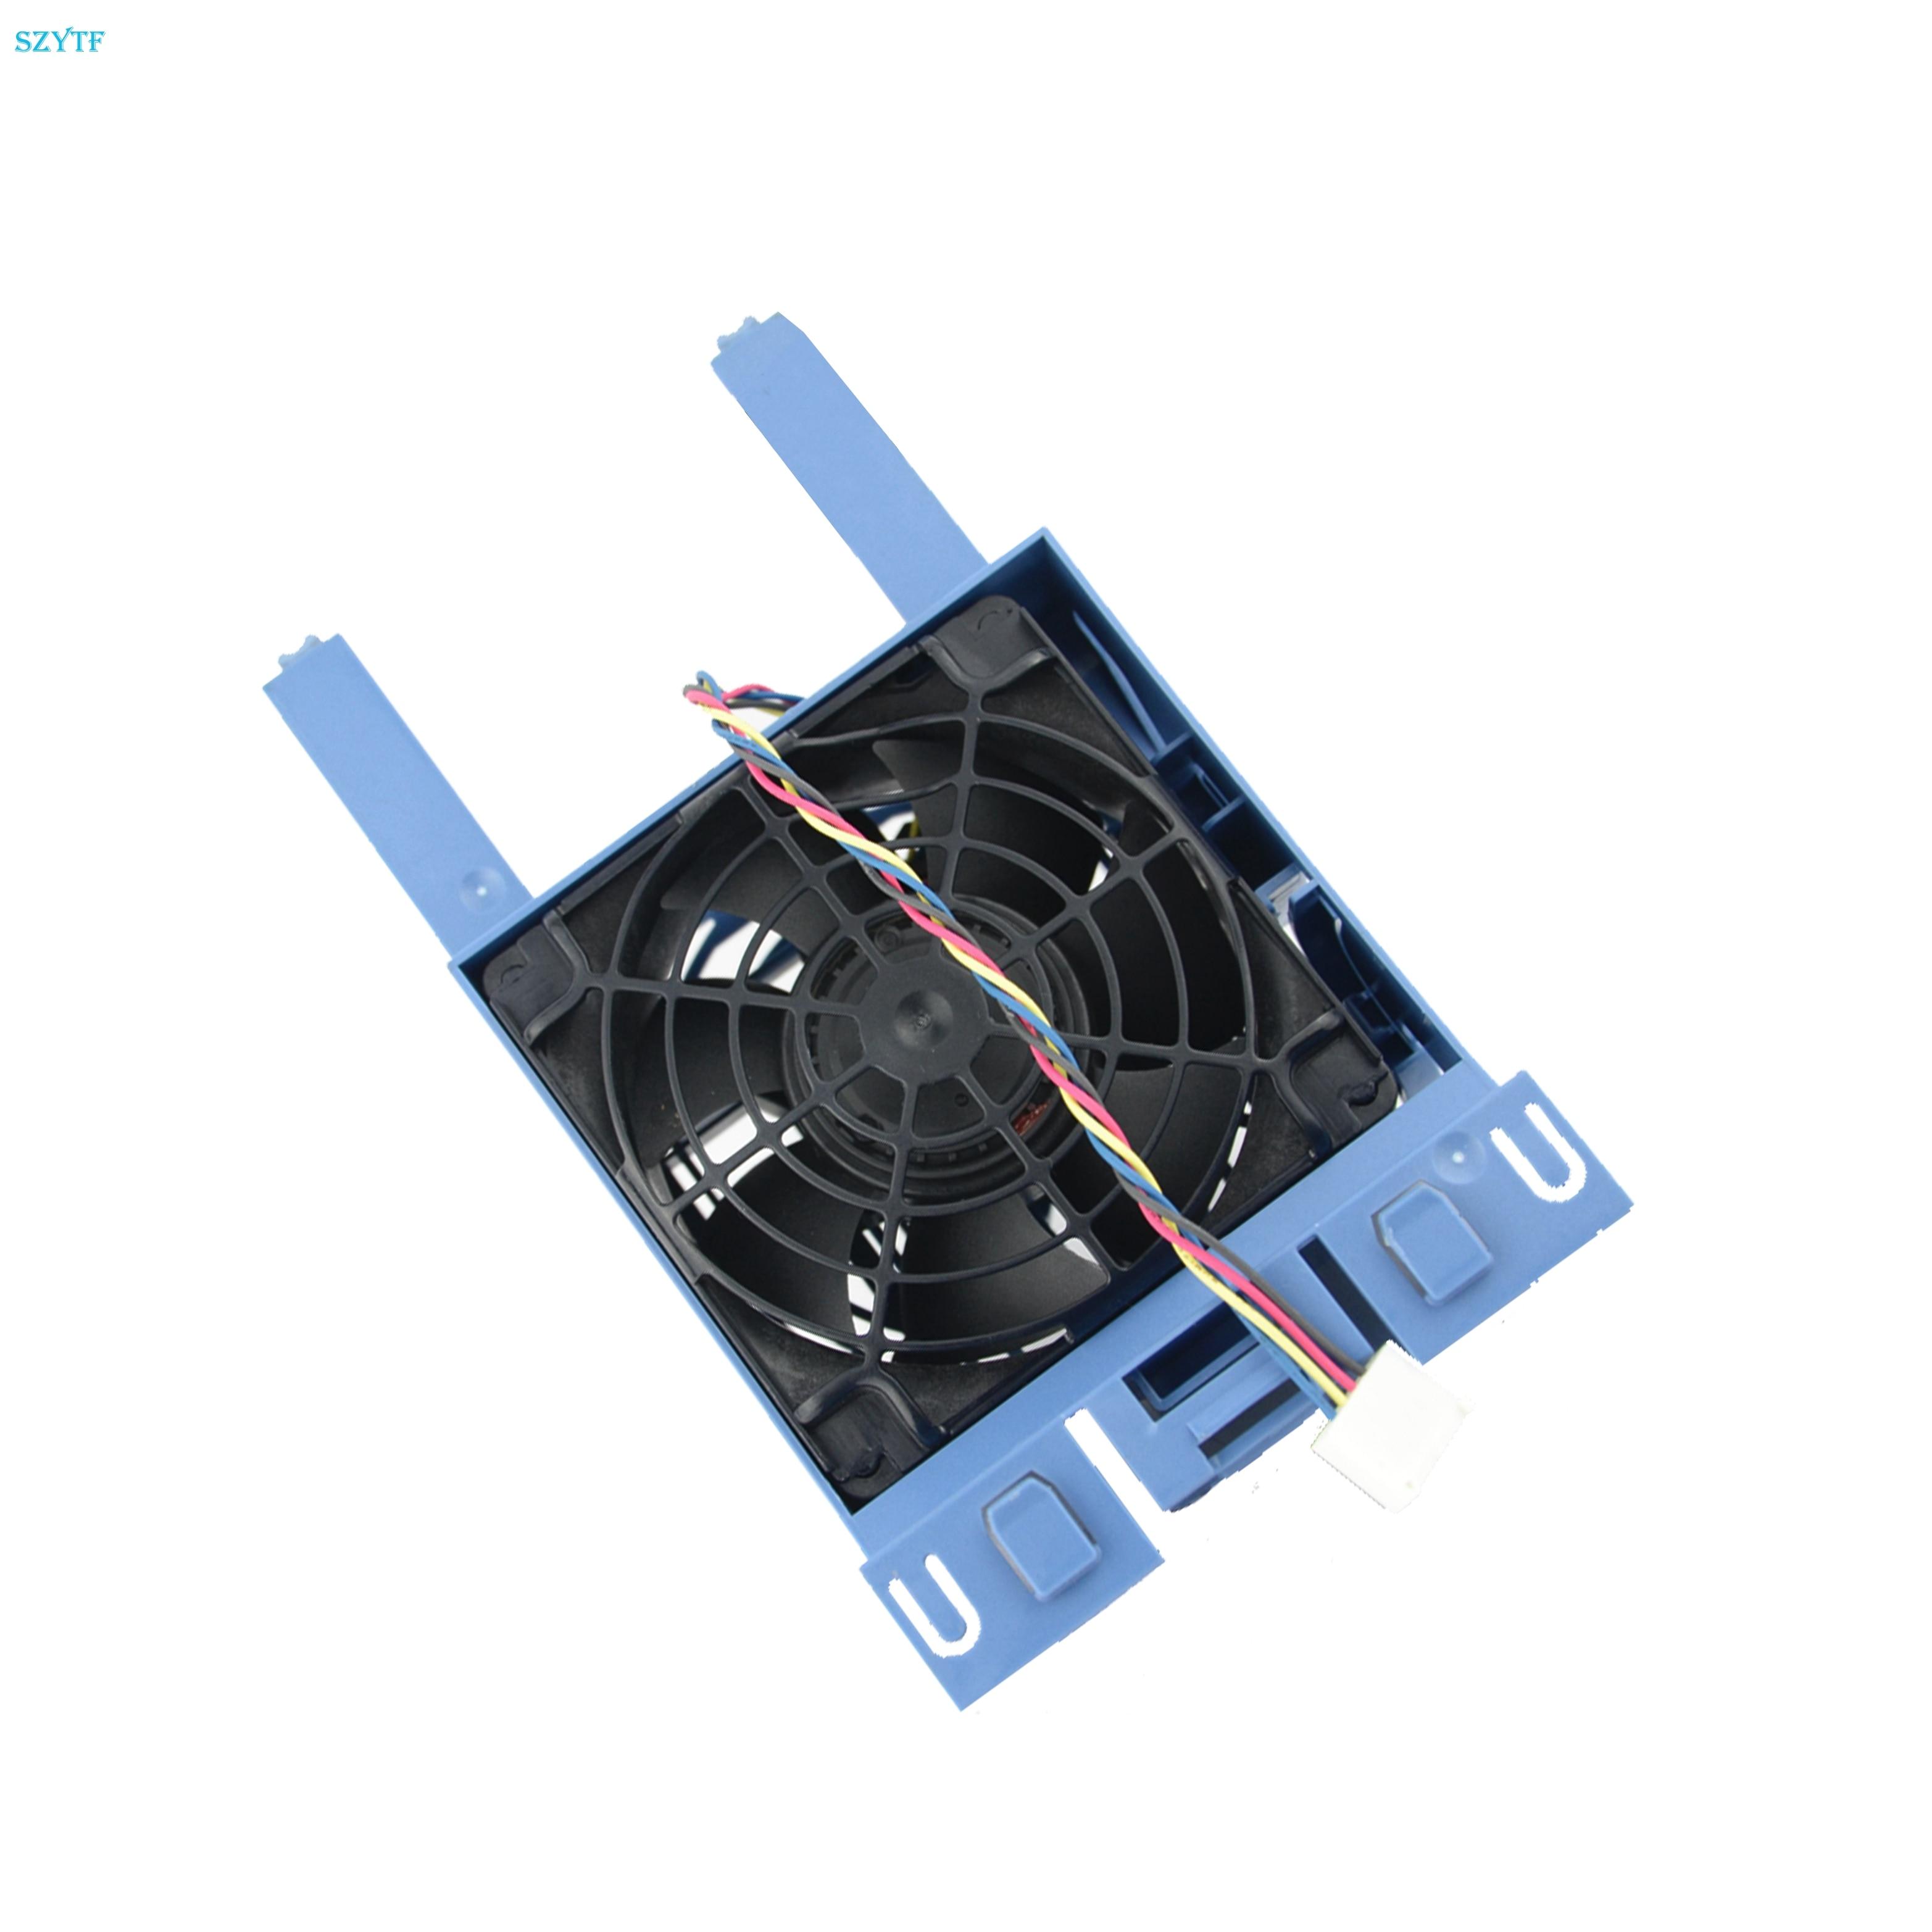 .ML150G6 original server P  N 487109-001 519740-001 server fans